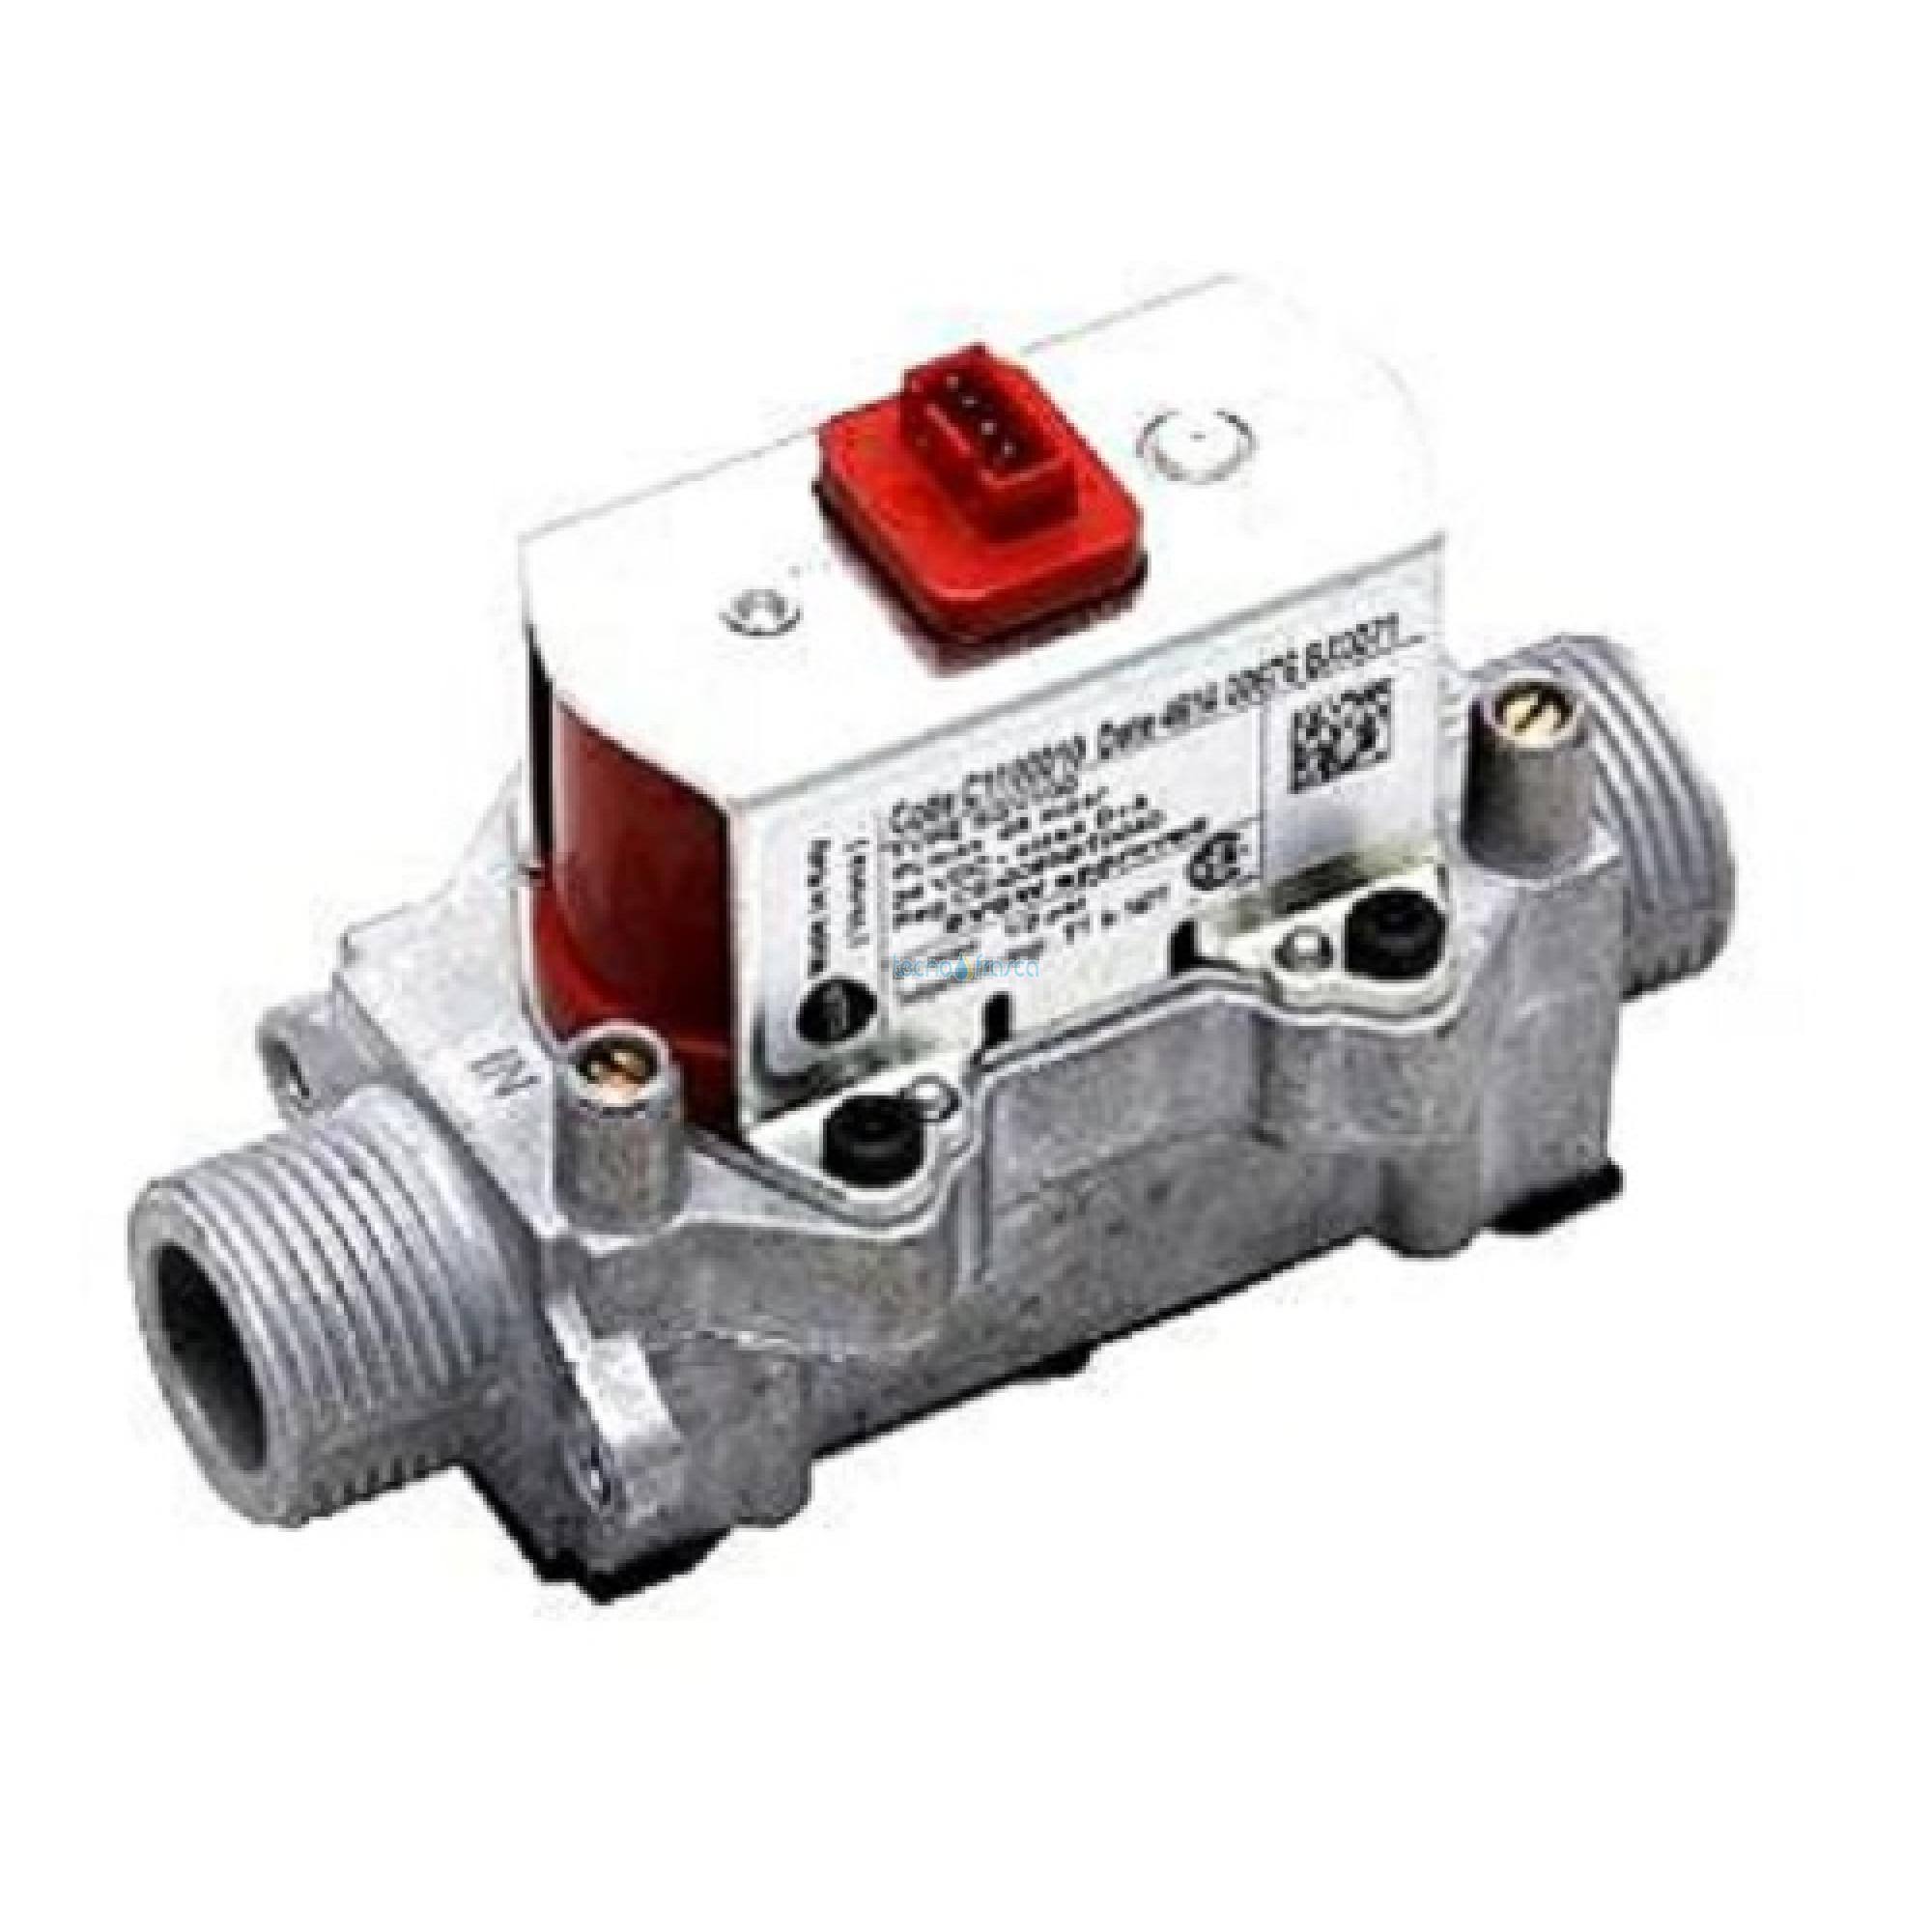 Bongioanni valvola gas b&p sgv100 c1100017 bi1373100